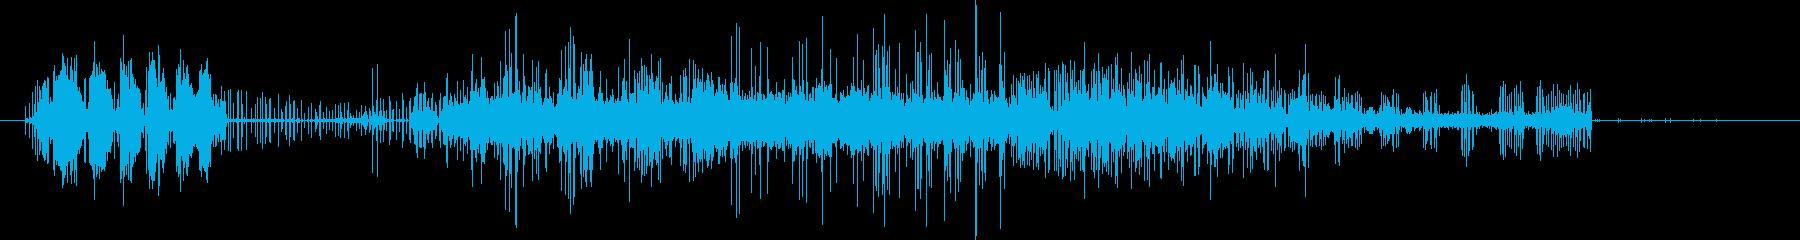 CINEMATIC BEEP 03の再生済みの波形